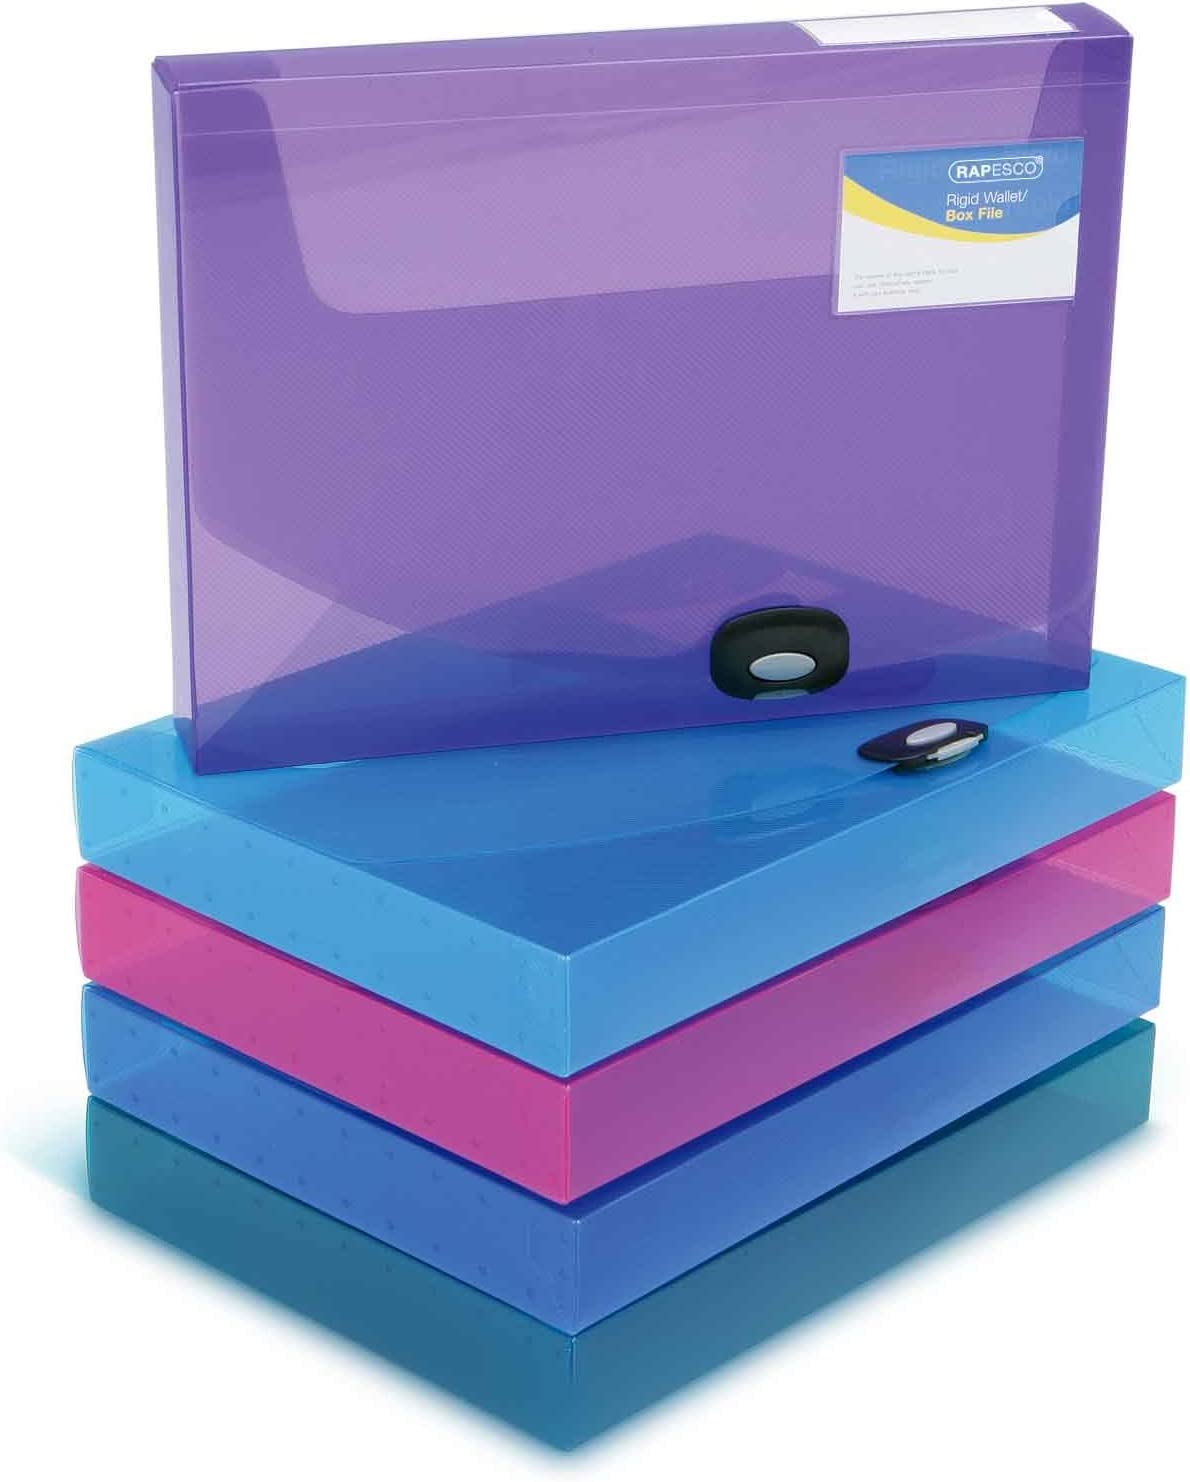 Rapesco Documentos - Caja de archivo A4, 40mm de ancho, varios colores transparente